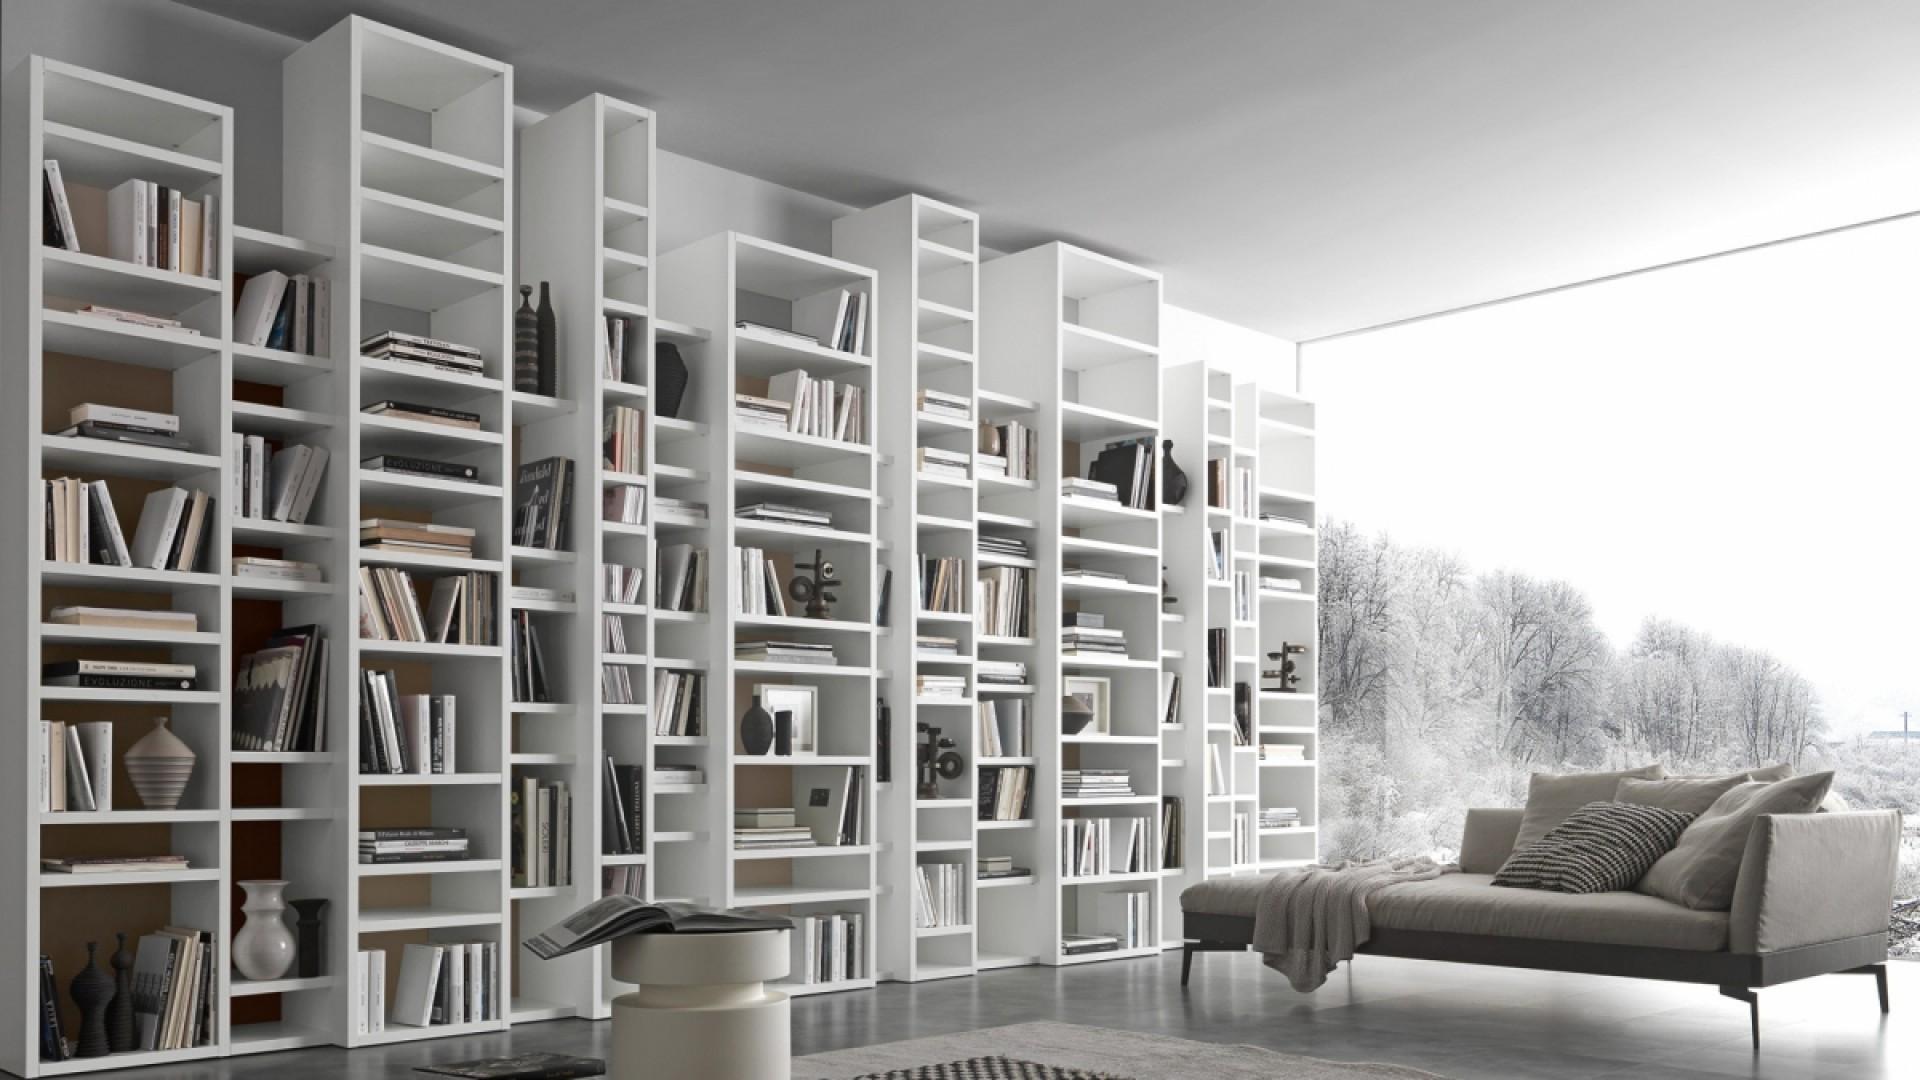 libreria-pari-dispari-composizione-3408D72A94F-5E28-3A97-8BAD-36C726FB21A1